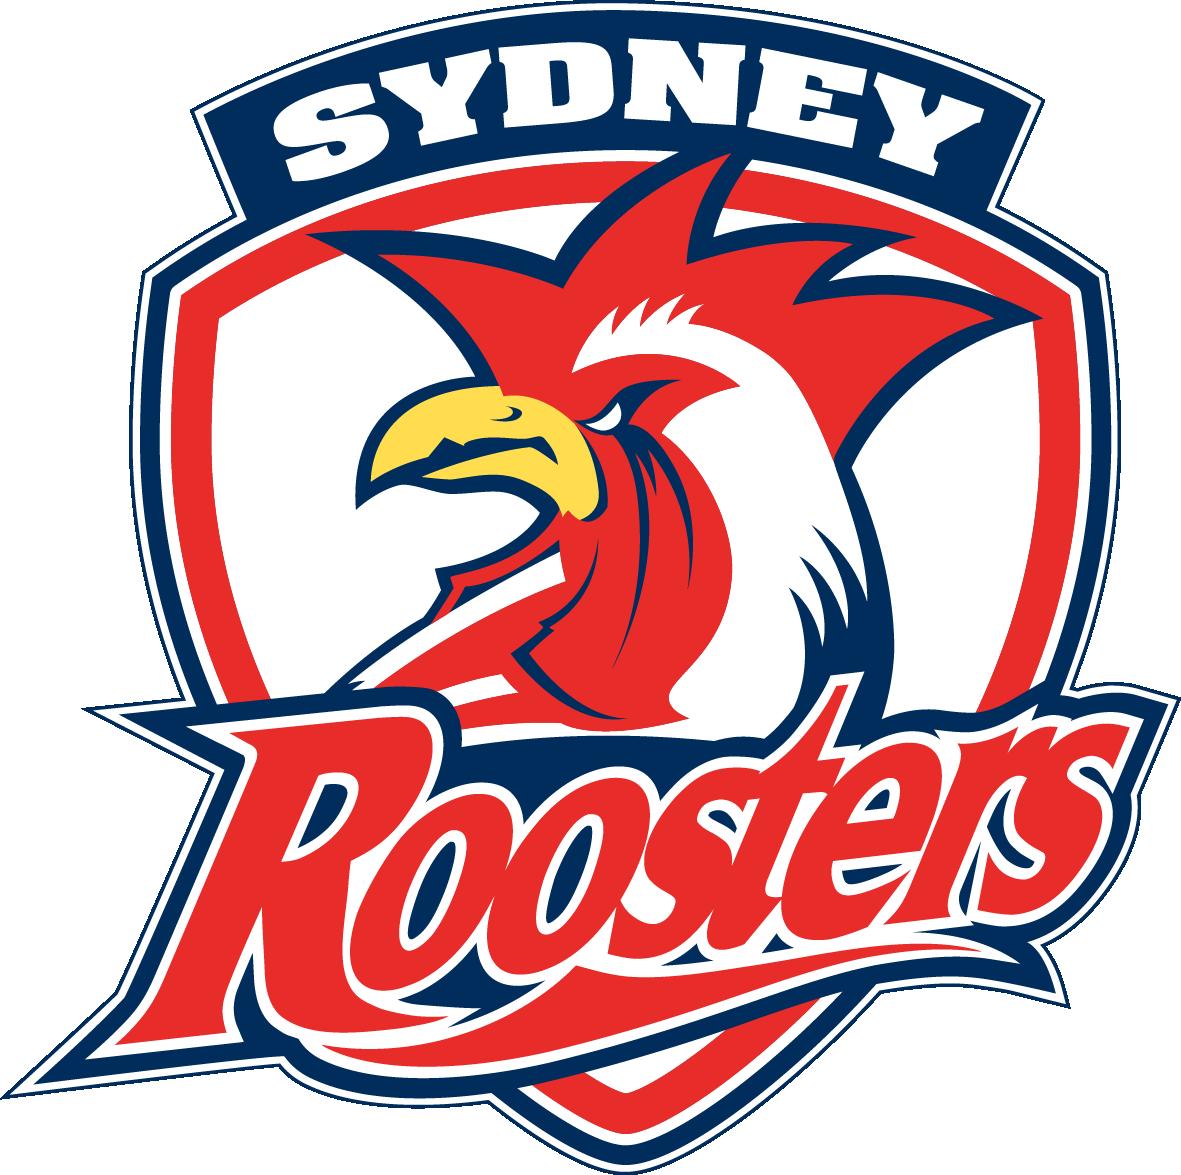 Sydney Roosters Tube Bandana